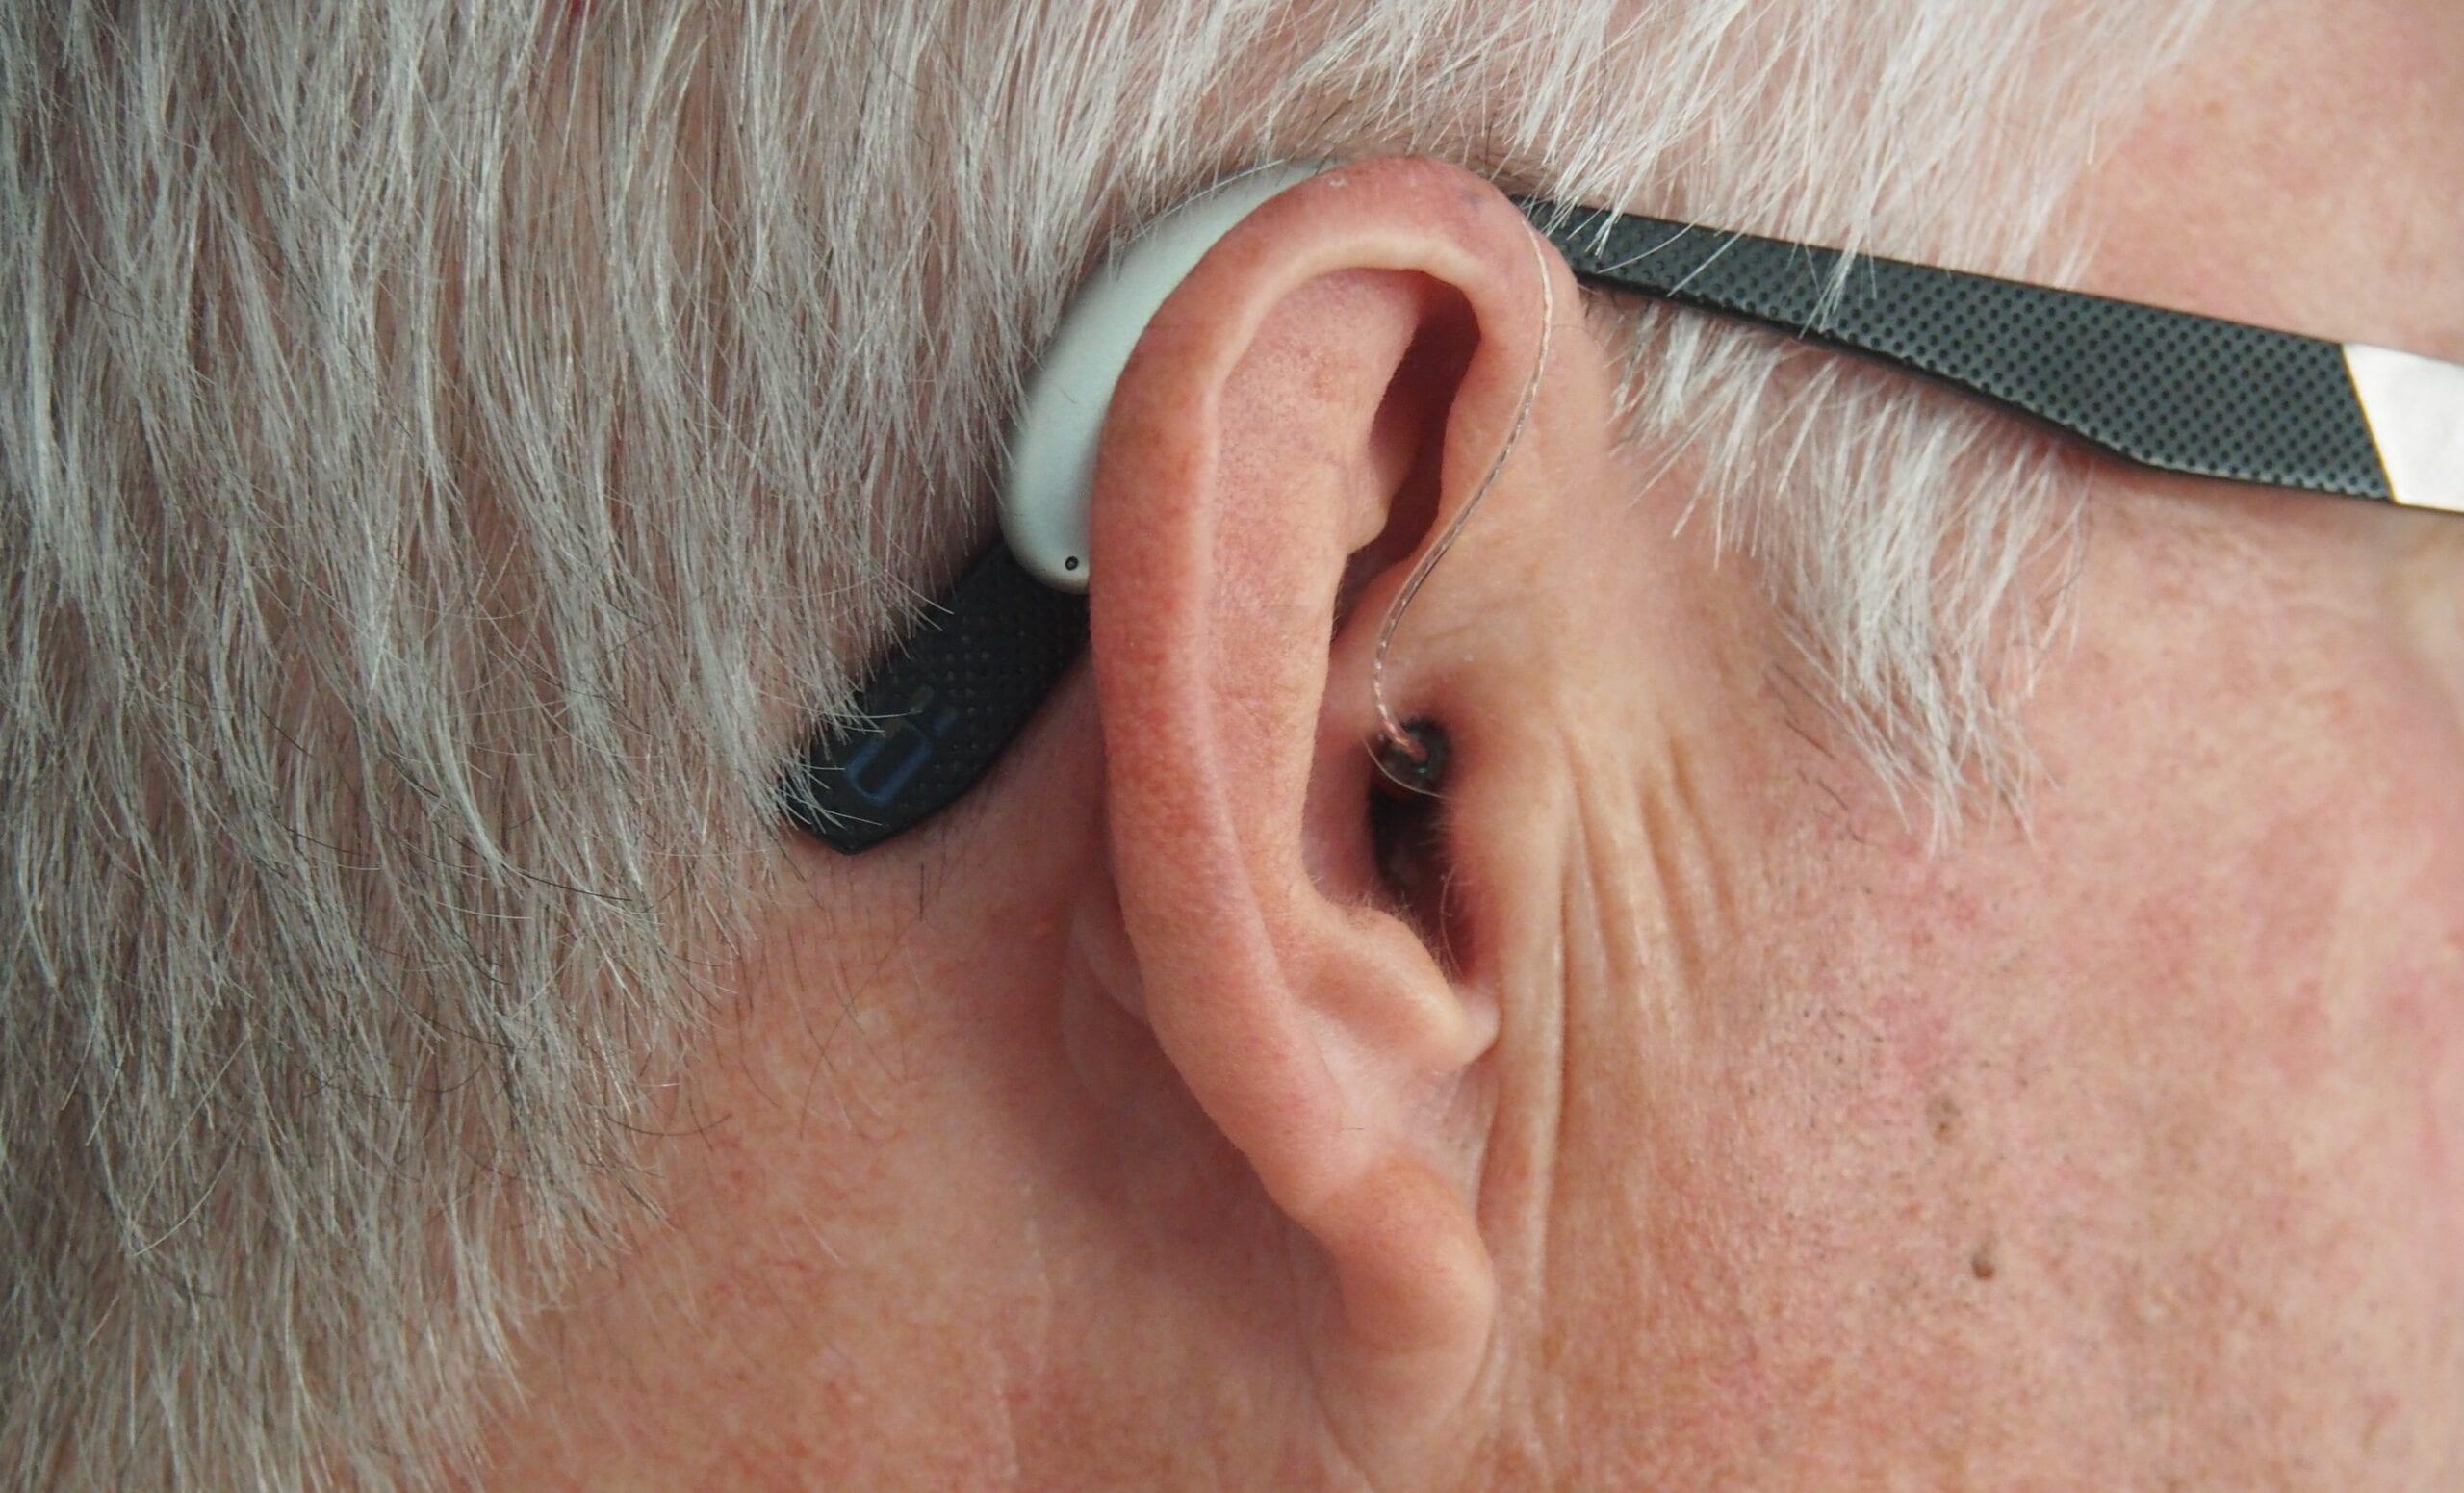 Hearing Aid in Ear. Hearing Aid Feedback. Hearing Aid Whistling.